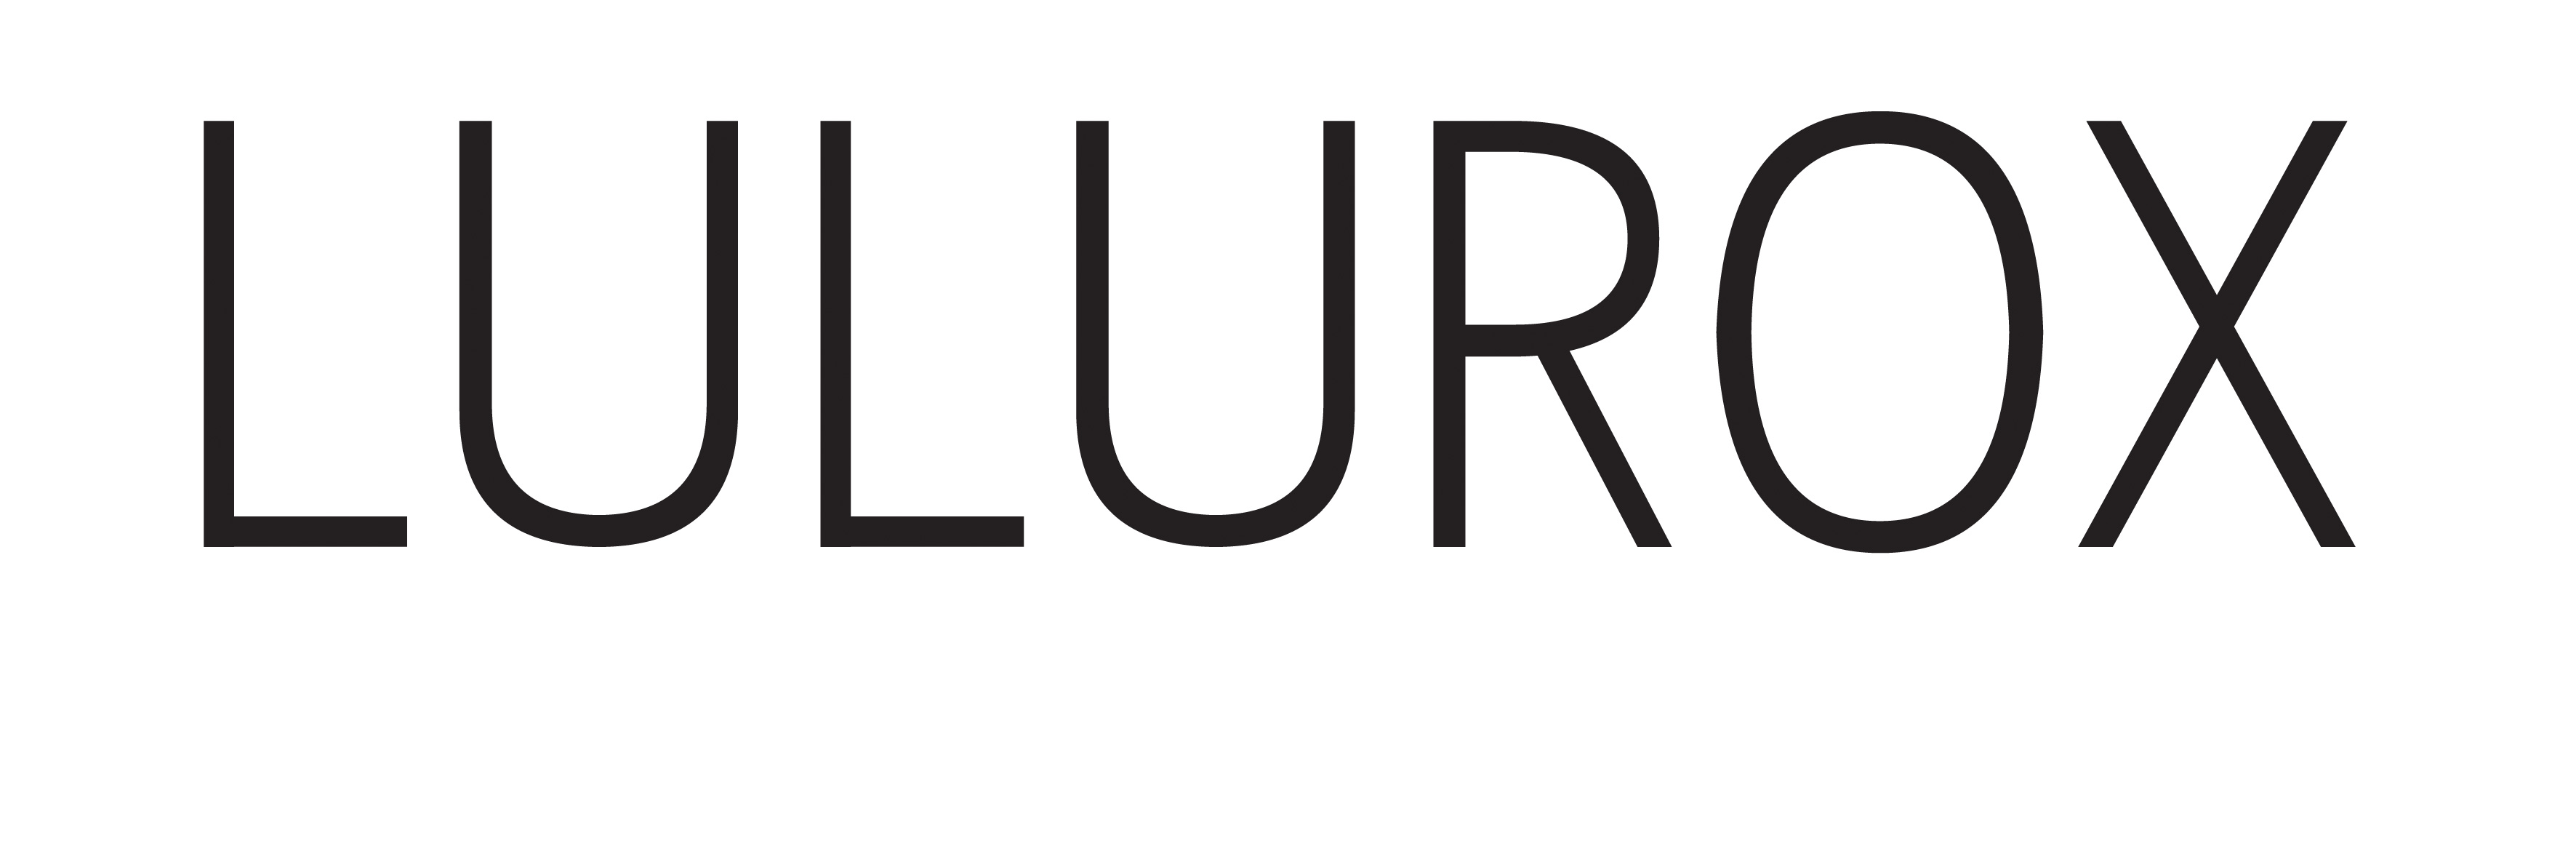 LULUROX-Black-RGB